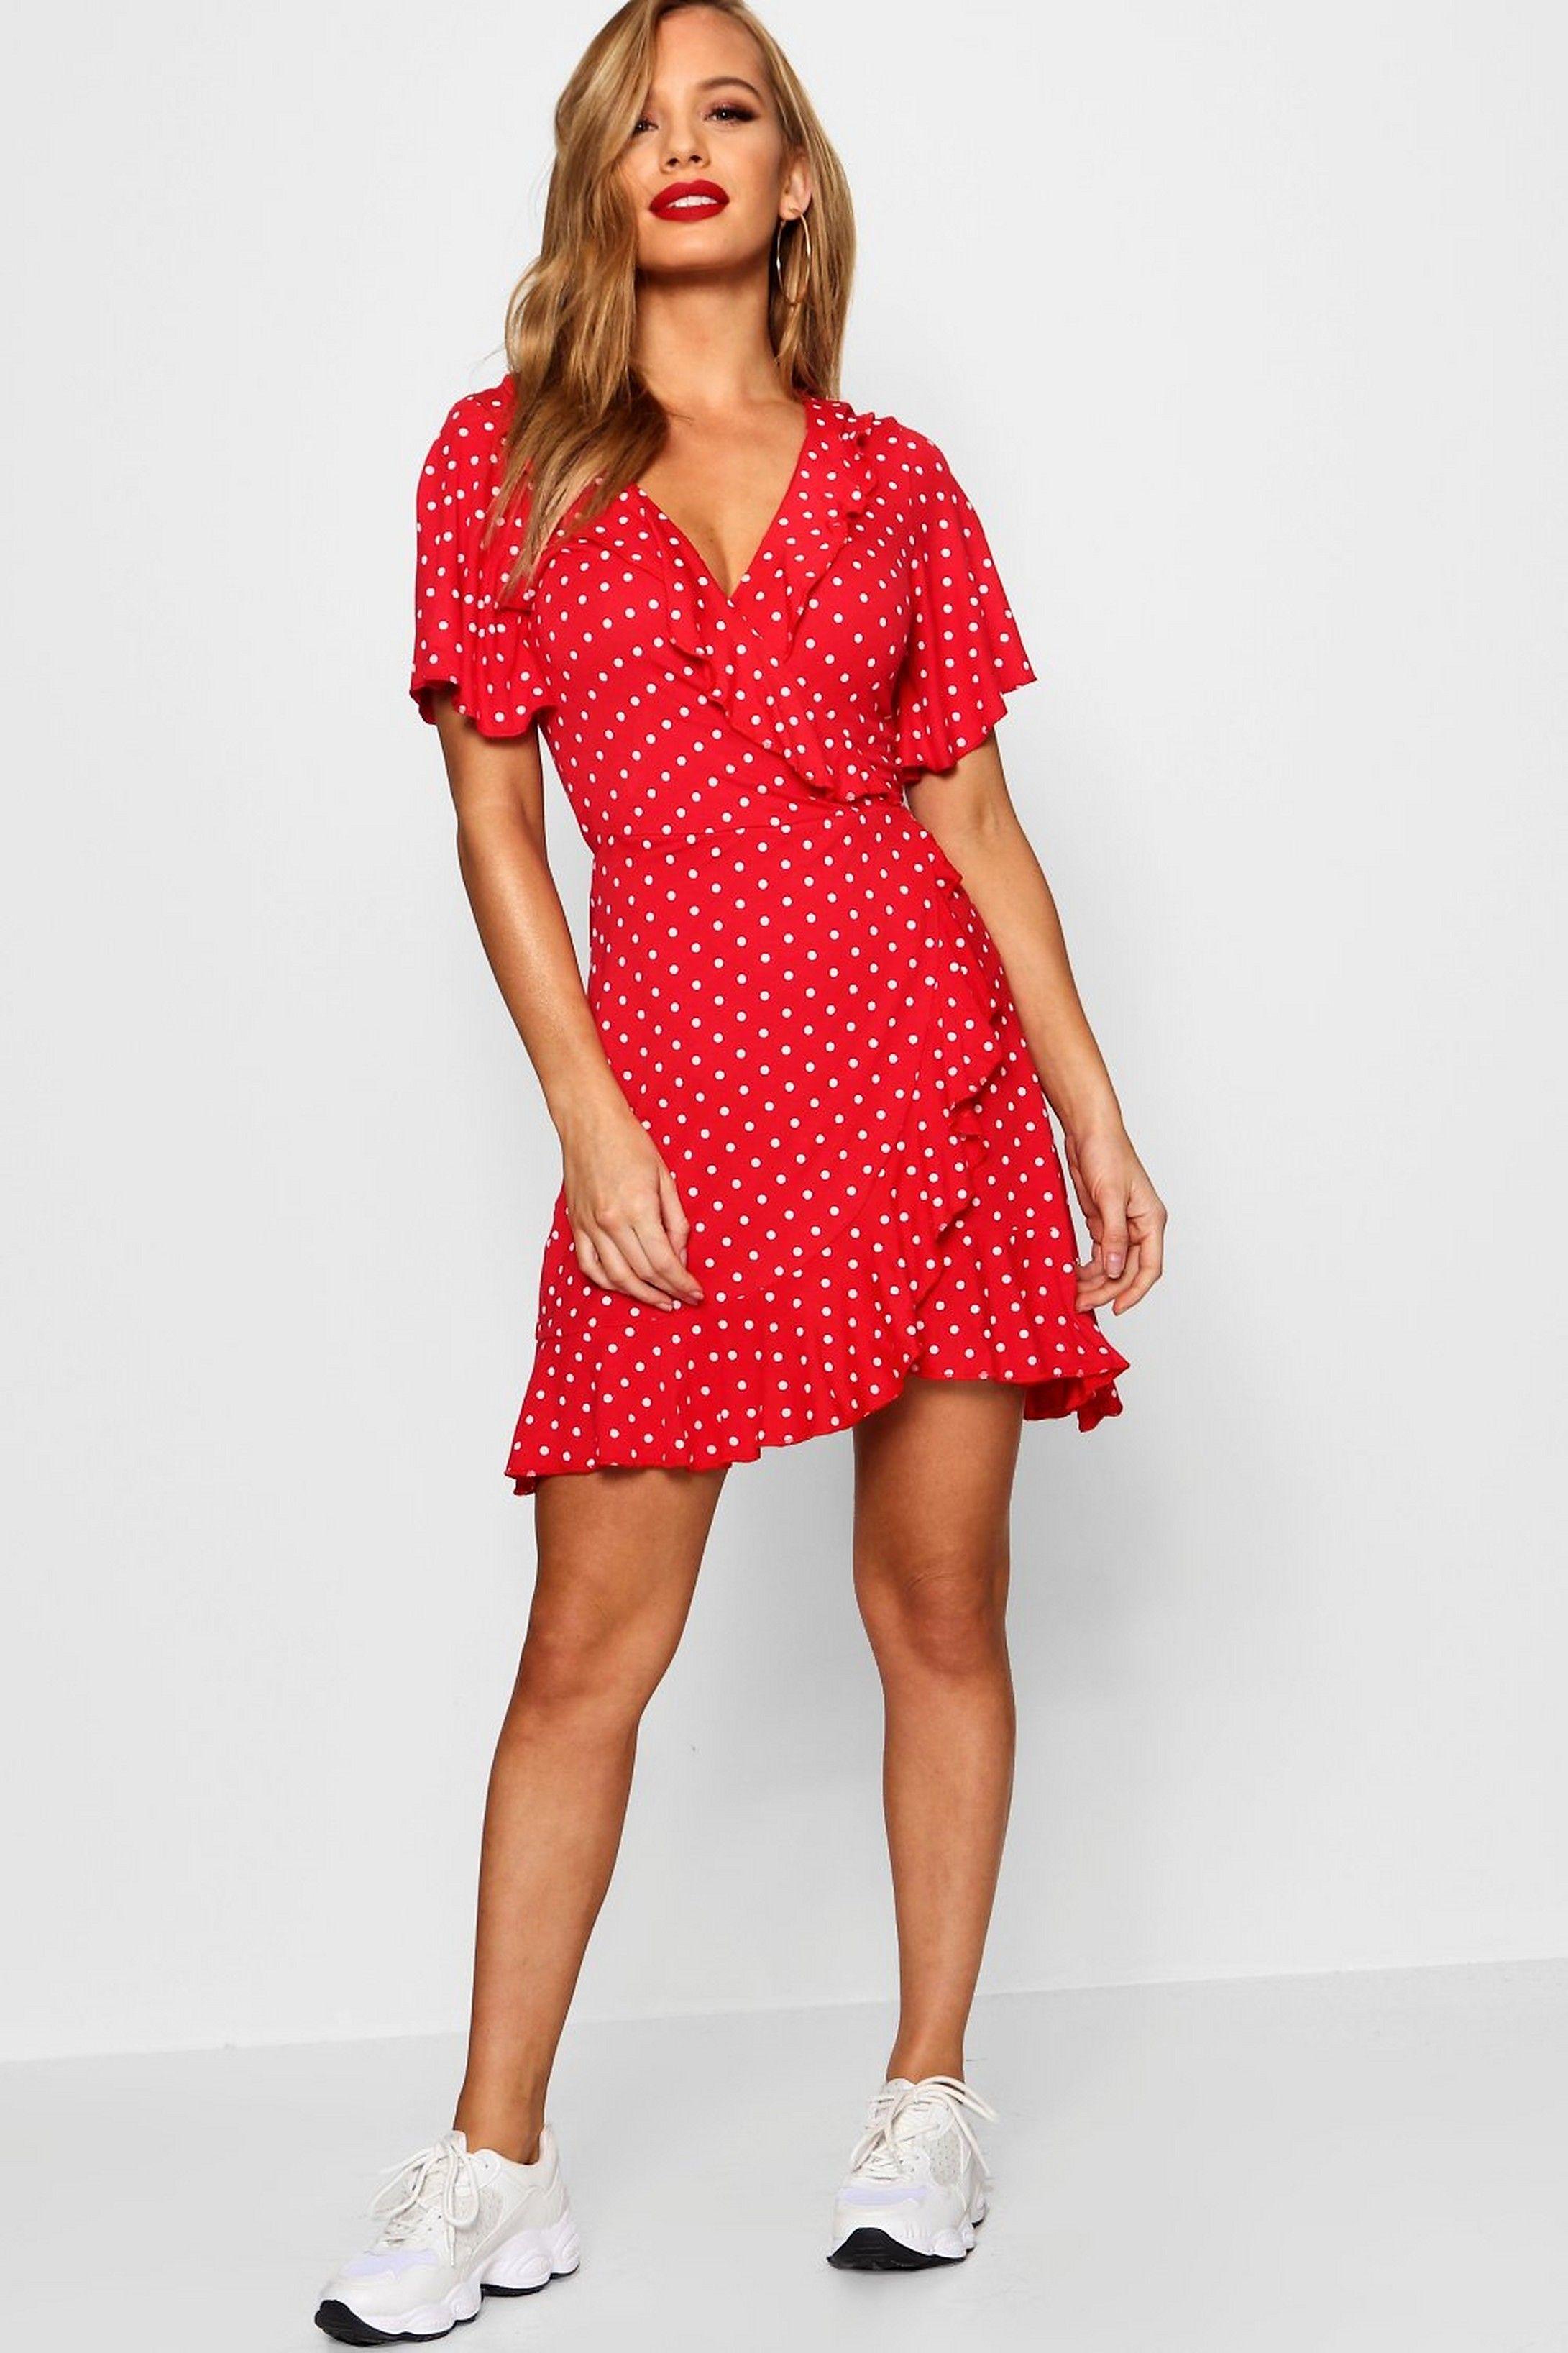 Petite Polka Dot Ruffle Wrap Tea Dress Boohoo Petite Dresses Tea Dress Petite Outfits